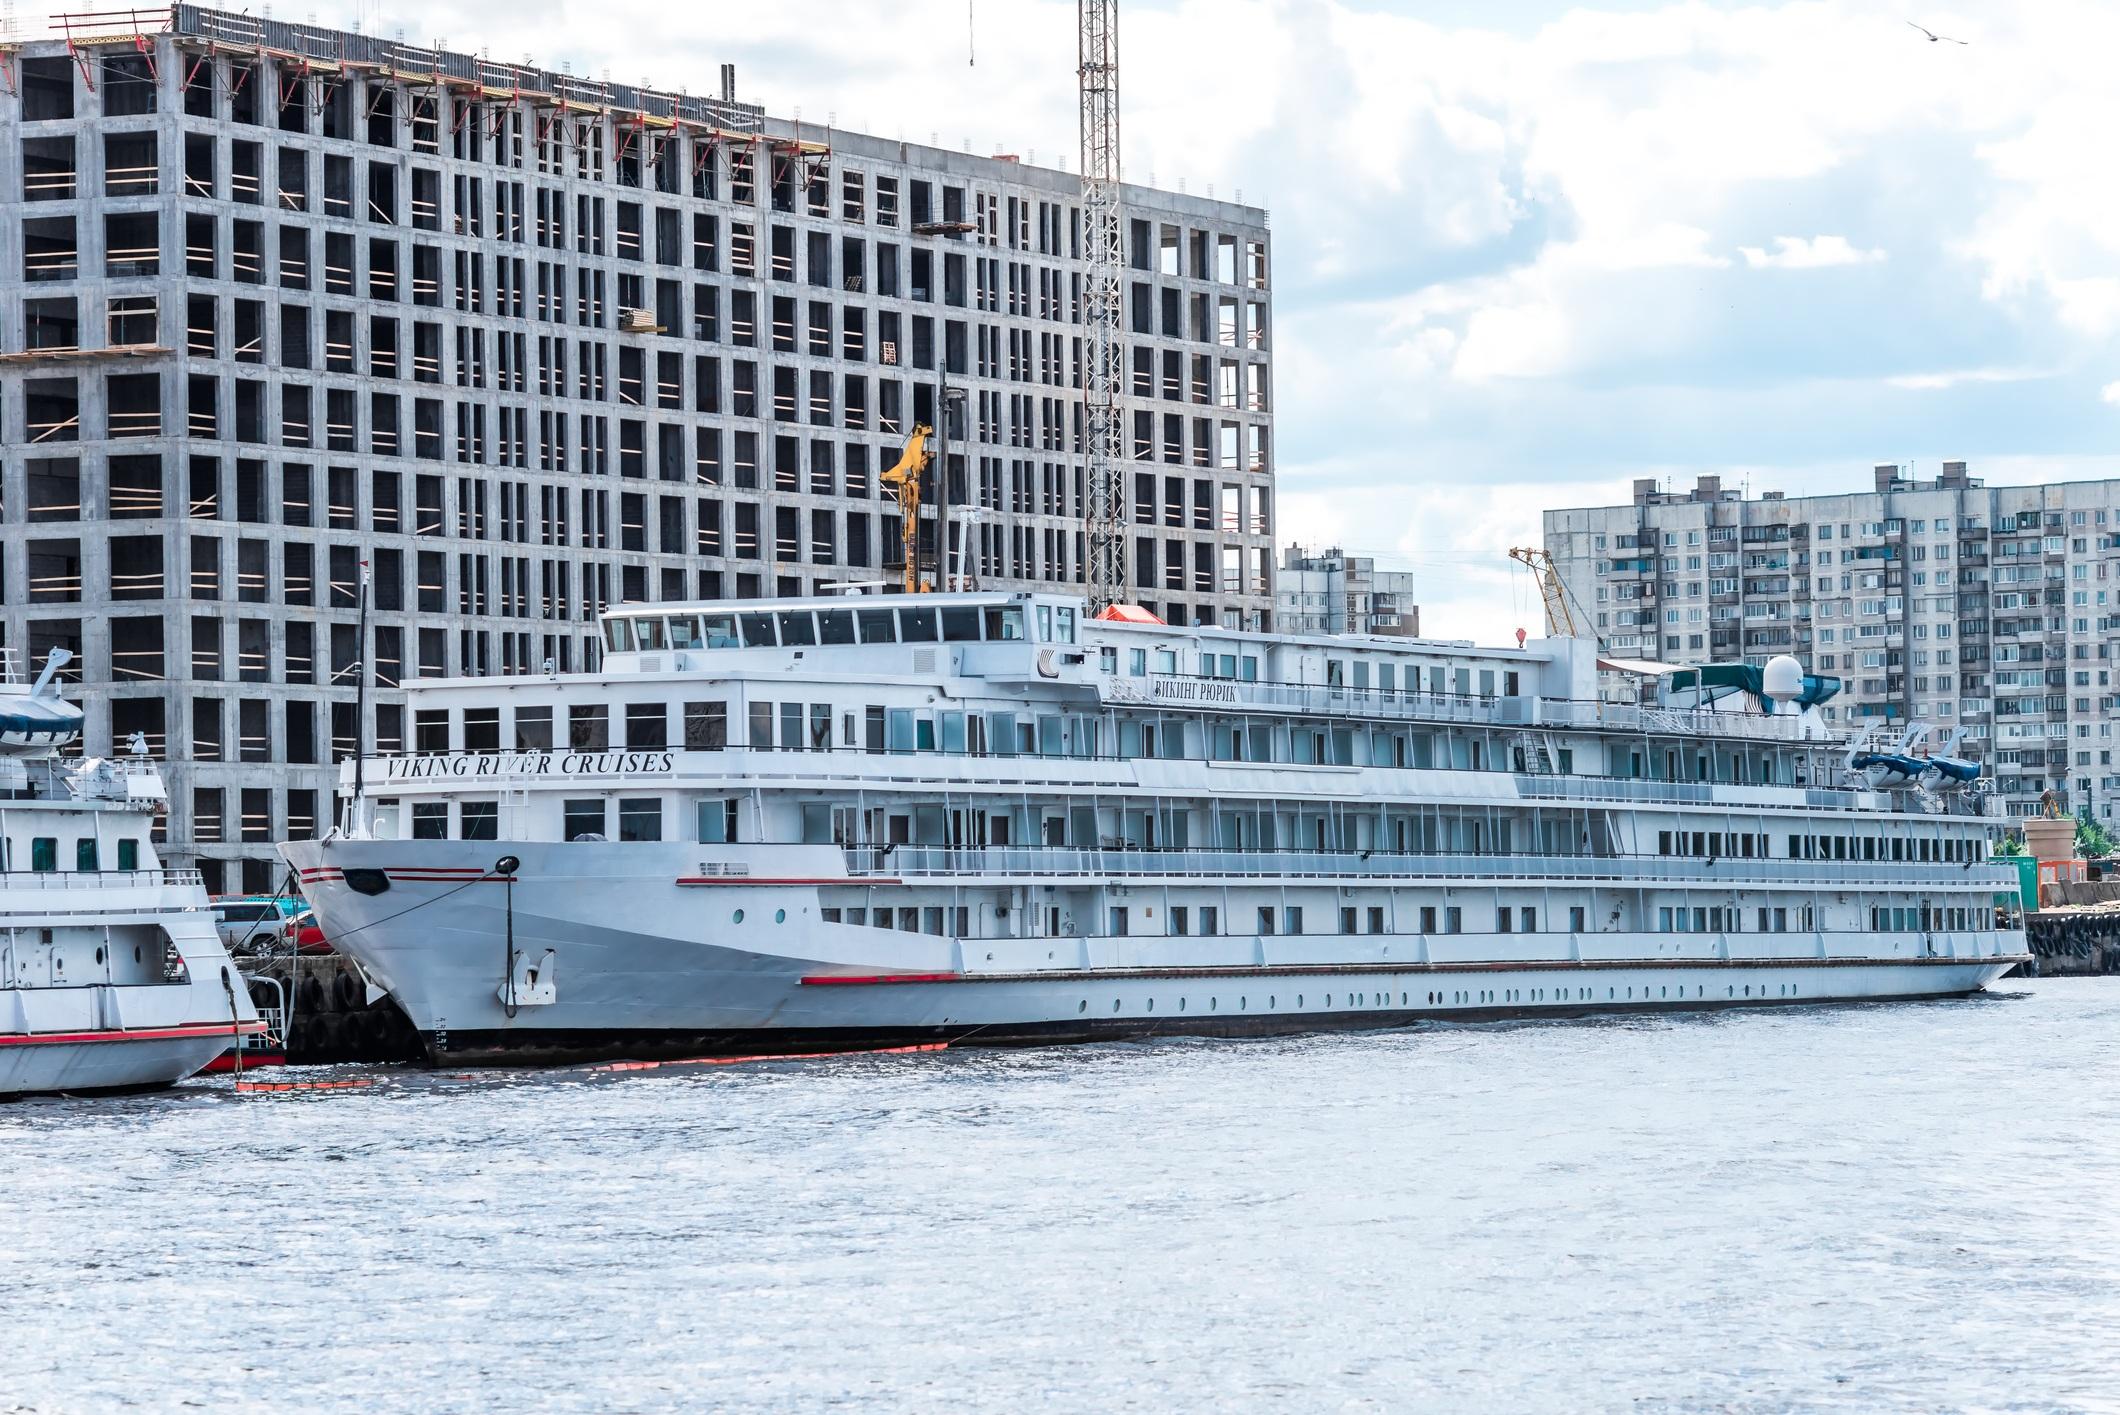 Viking river cruise lines ship